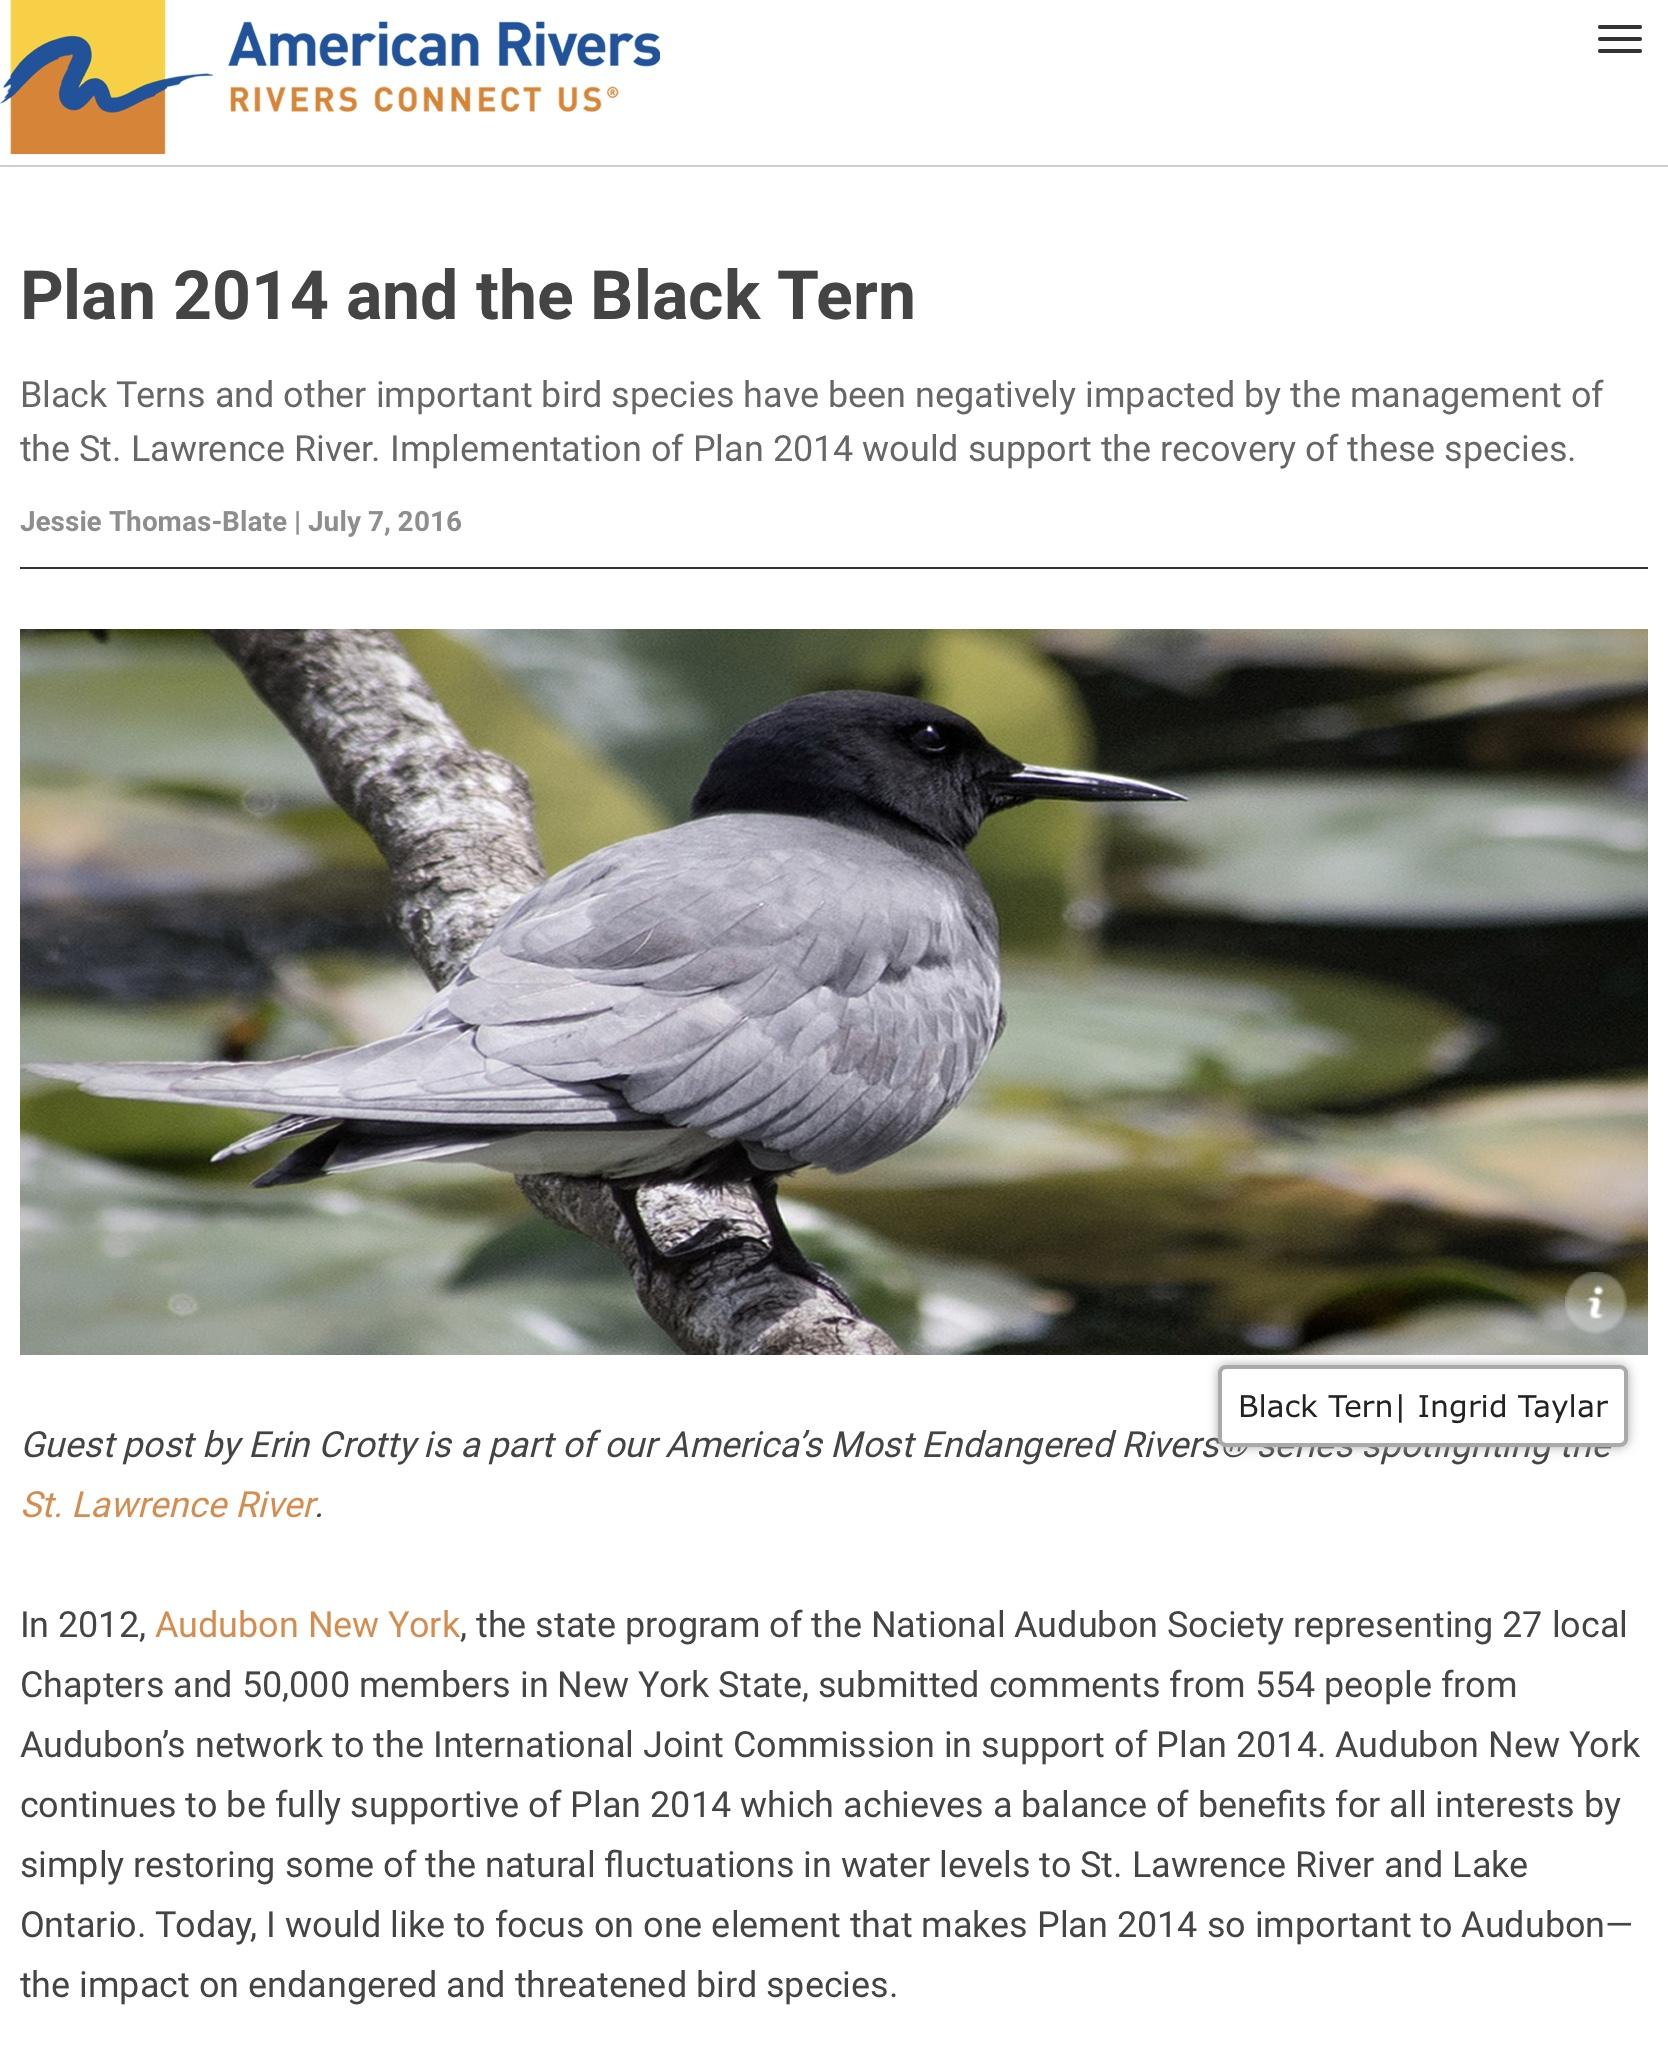 NRDC Black Tern